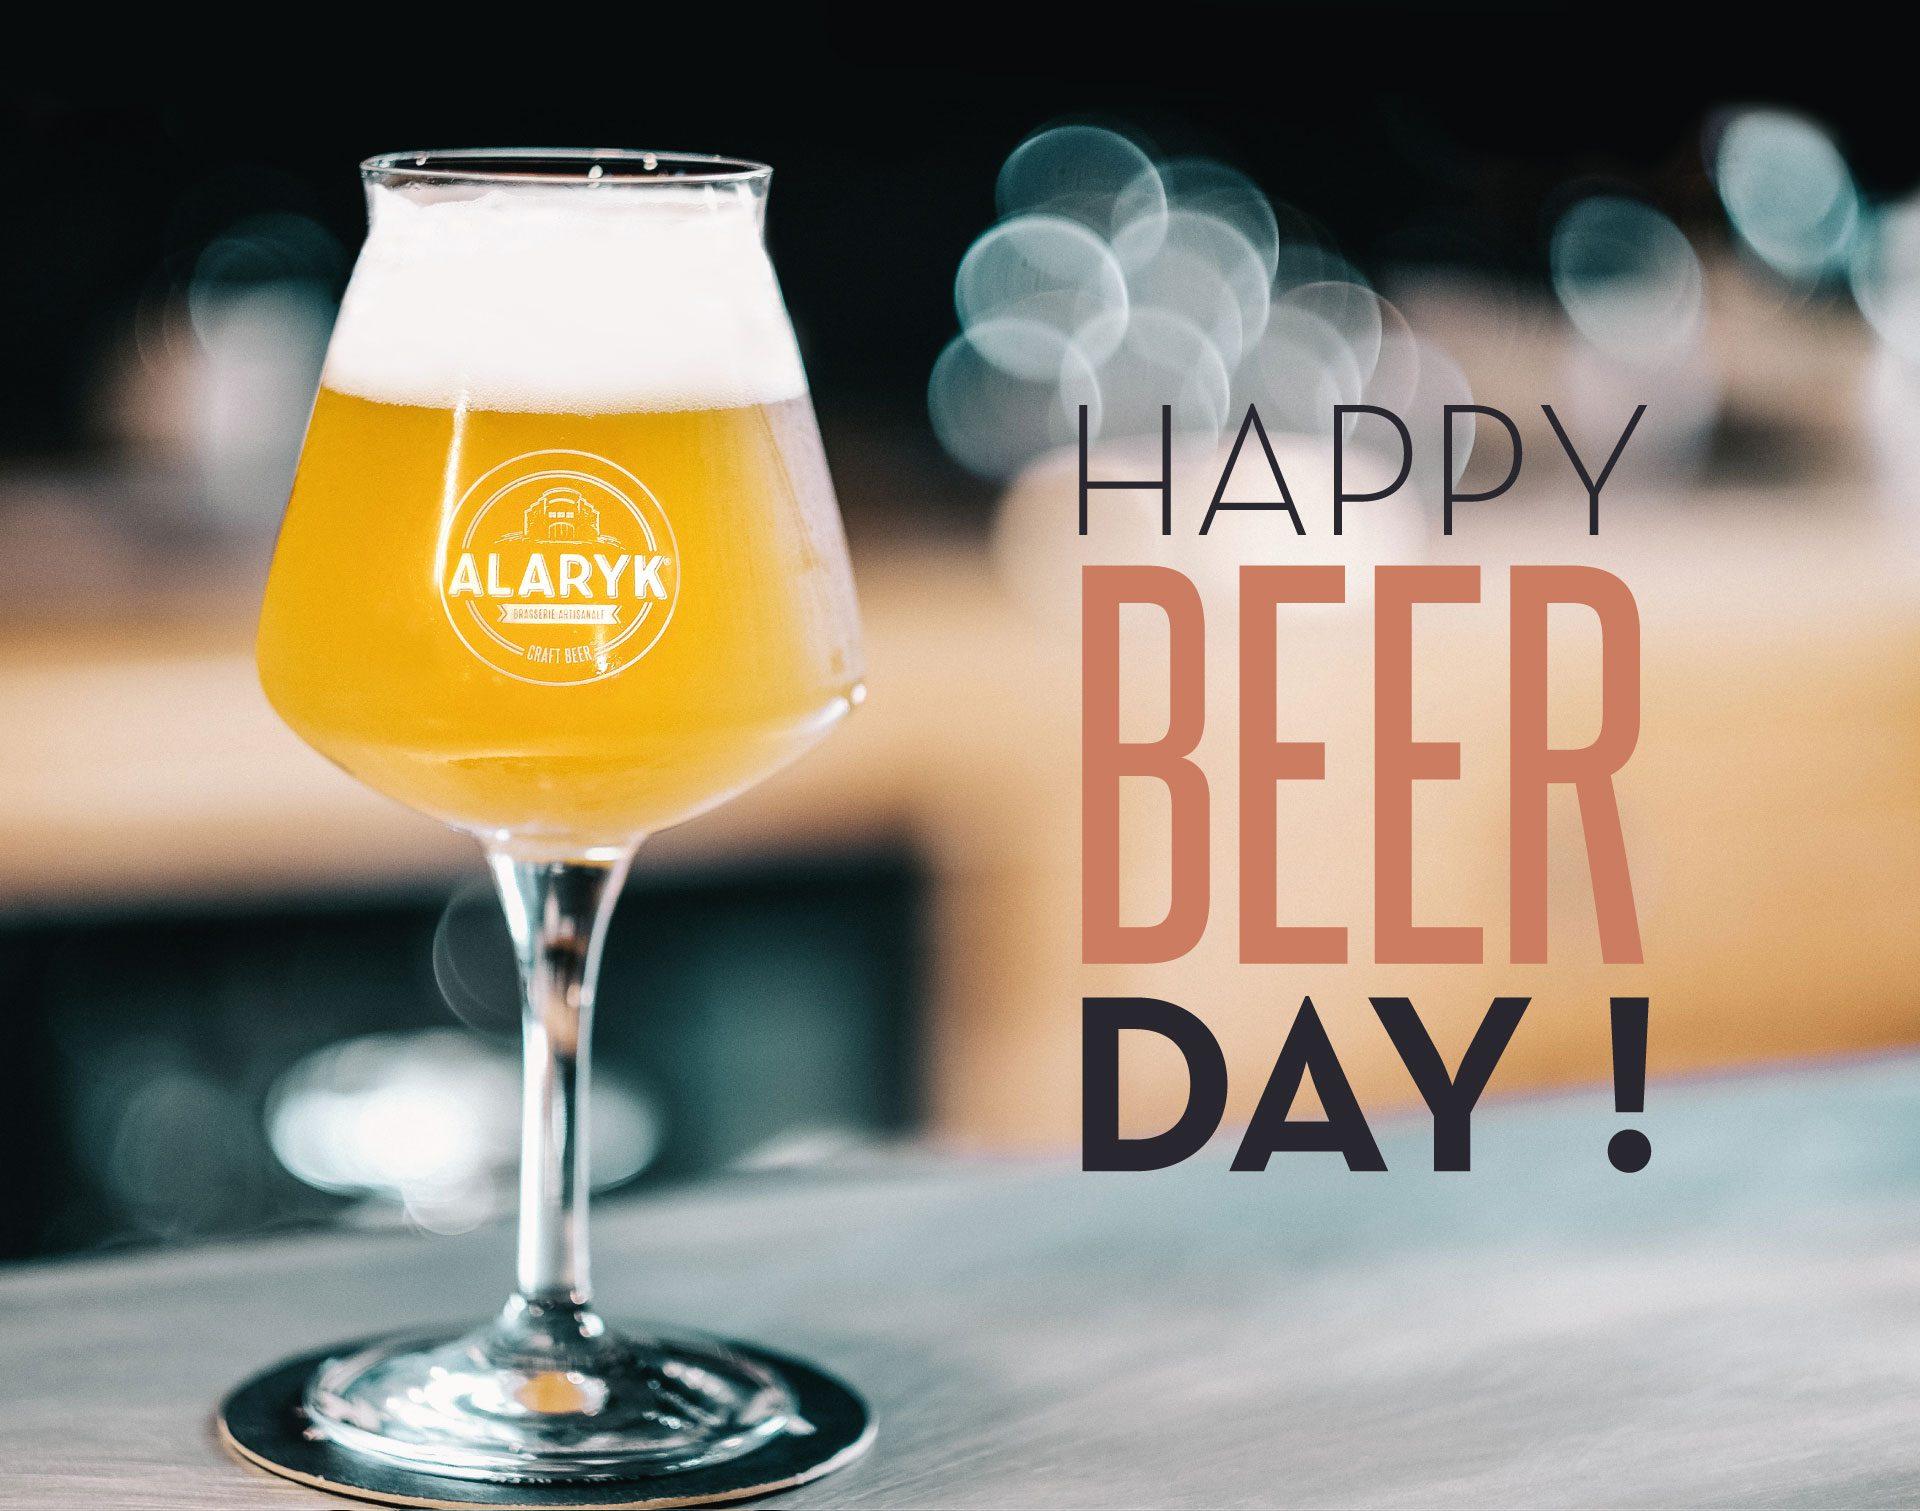 Happy beer day !